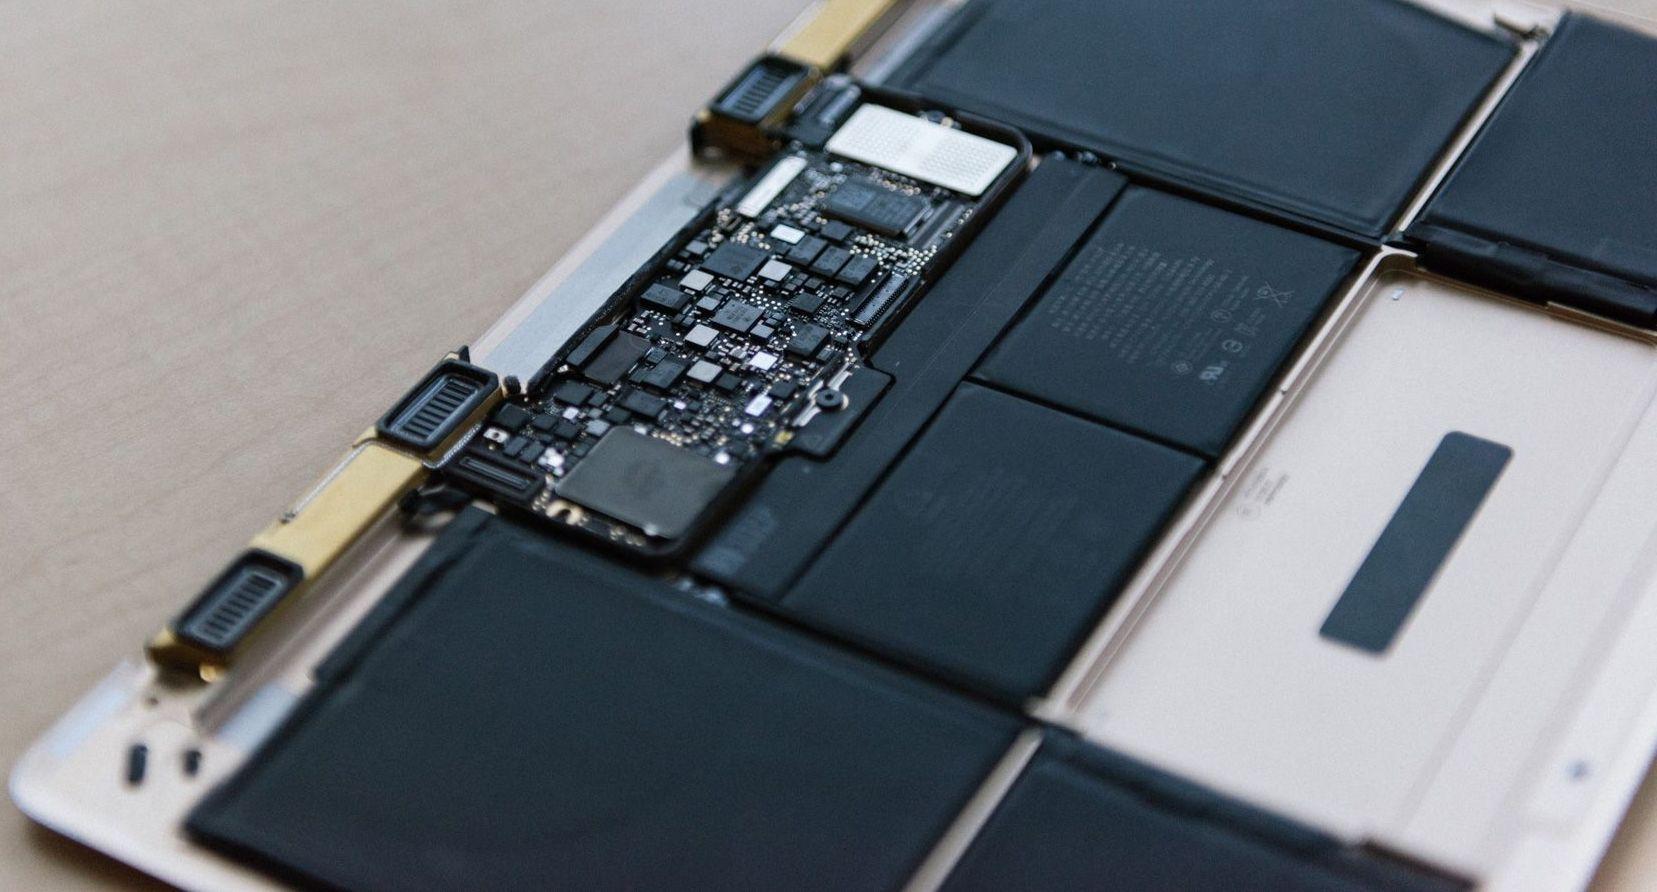 Responsible ModMac: error 4013 and unauthorized rebooting MacBook